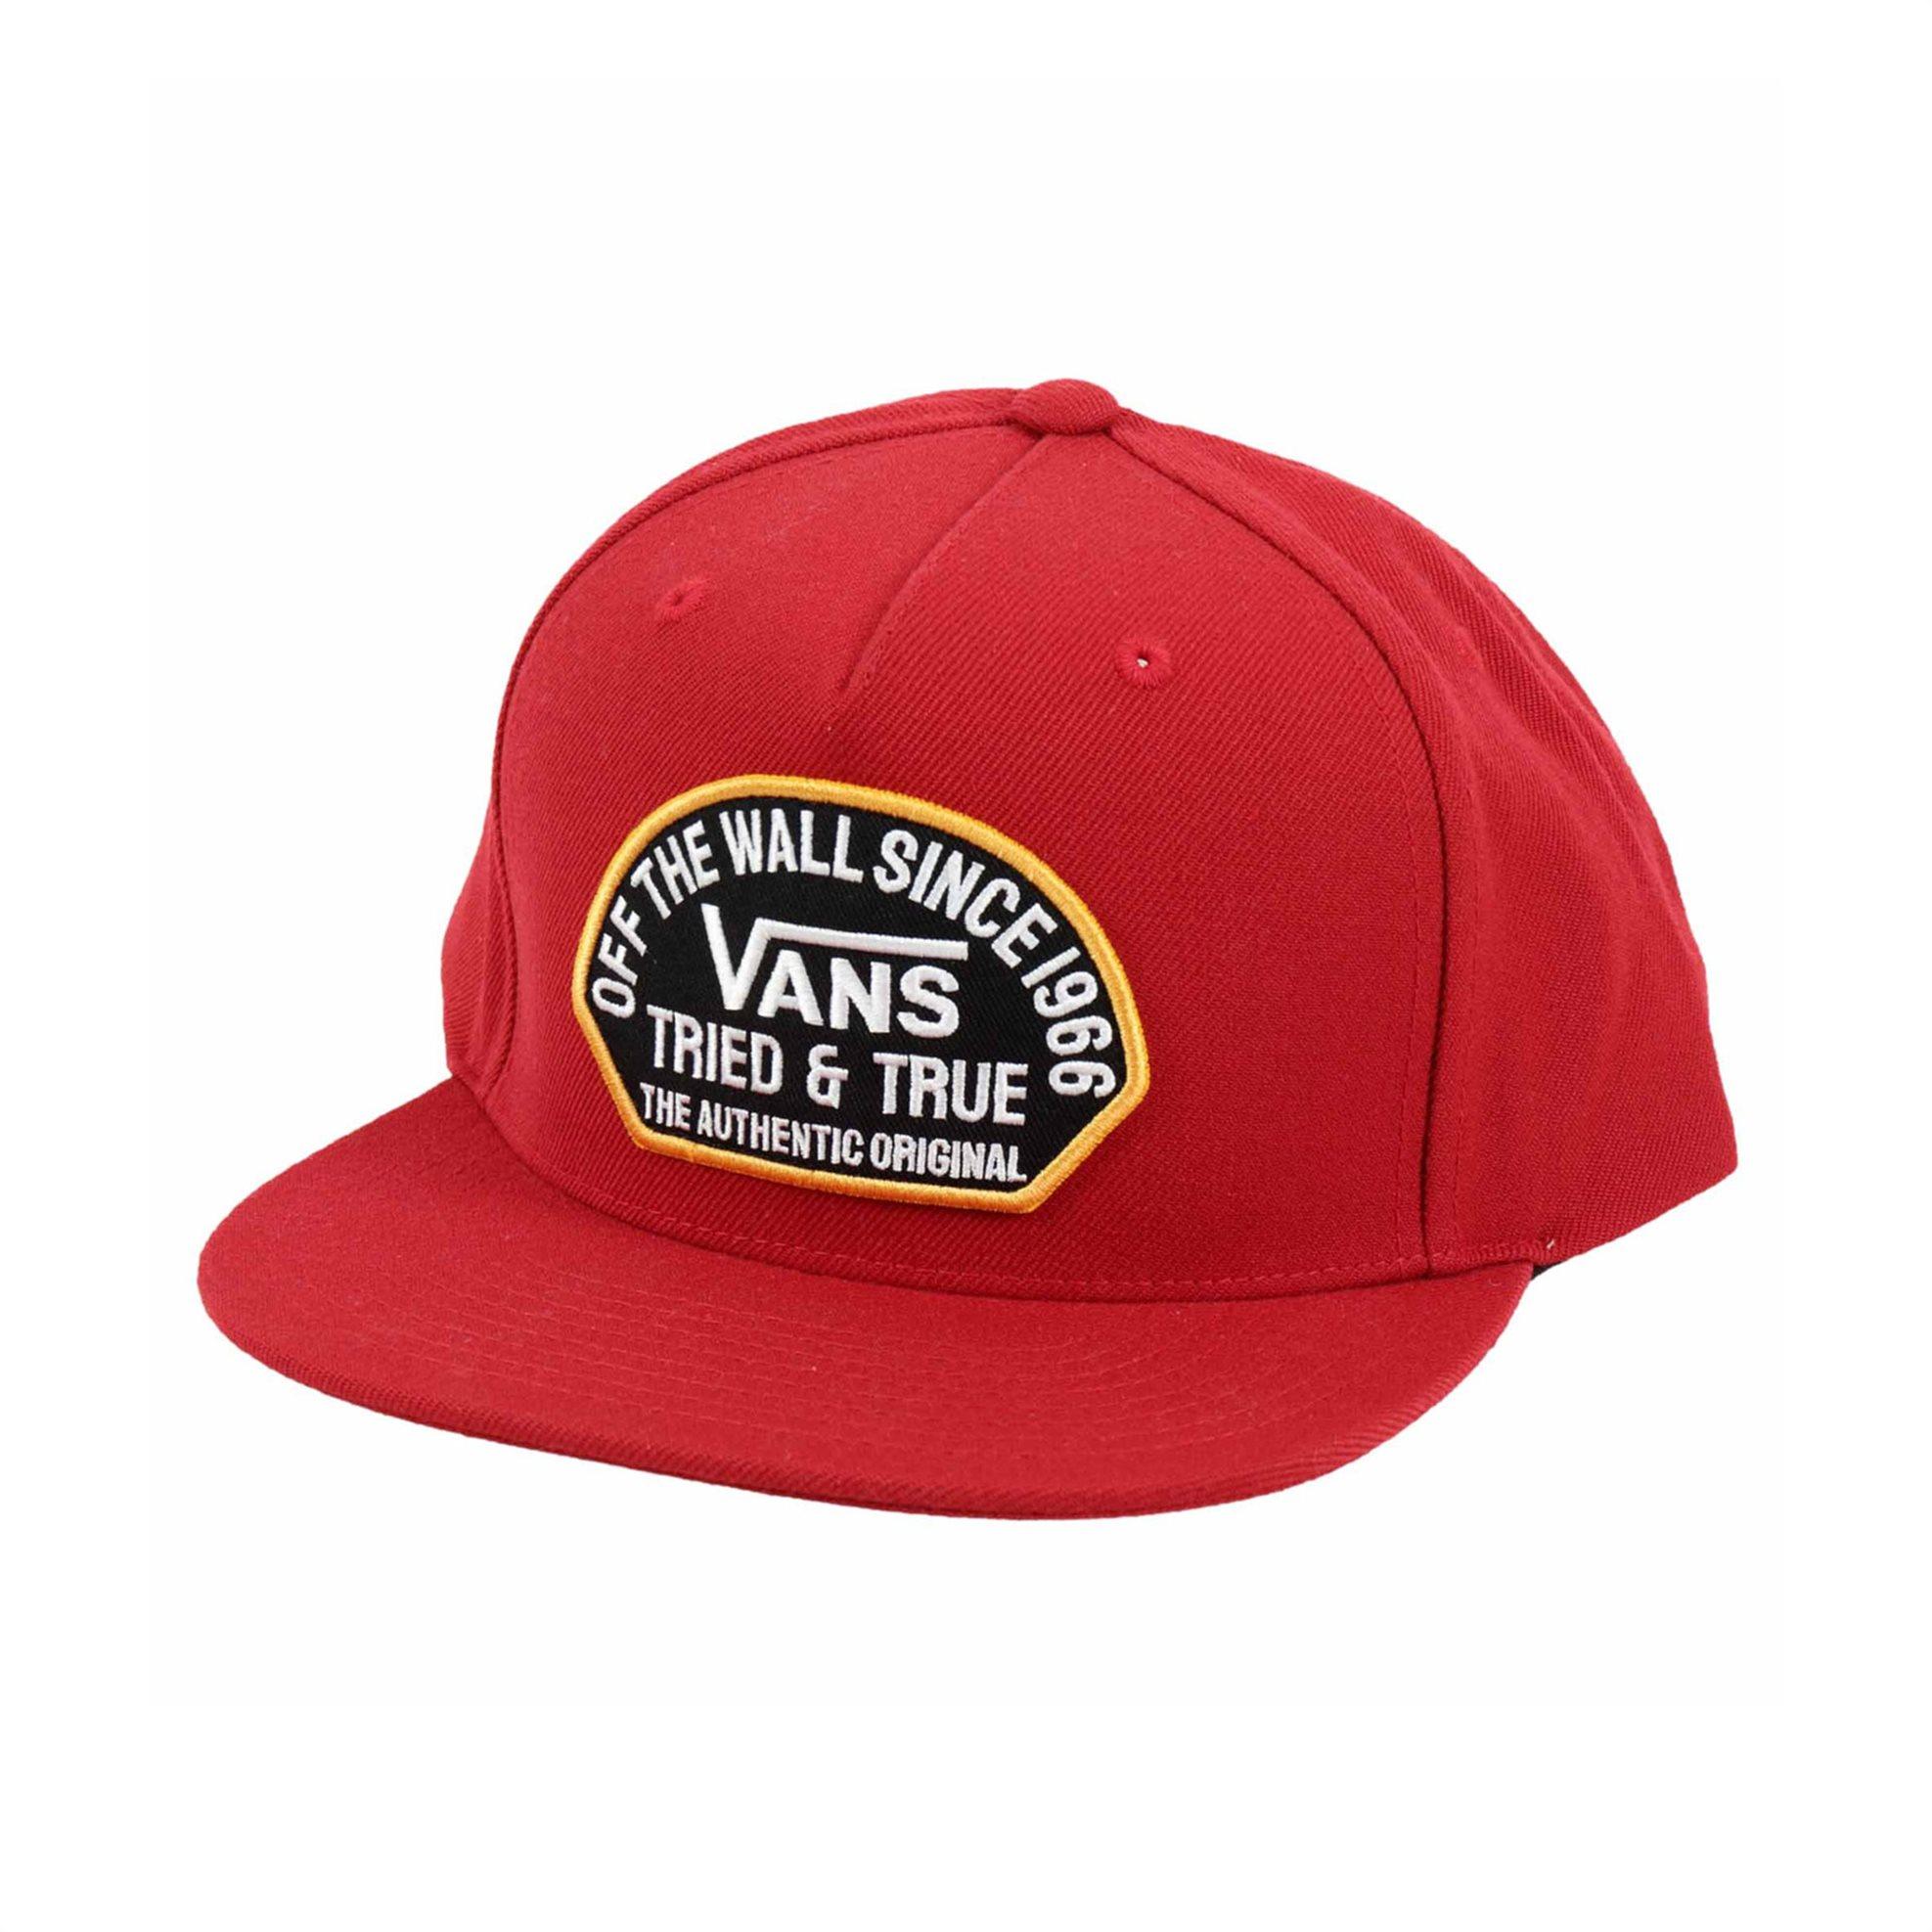 Vans ανδρικό καπέλο με logo patch ''Authentic Og'' - VN0A4TPU14A1 - Κόκκινο